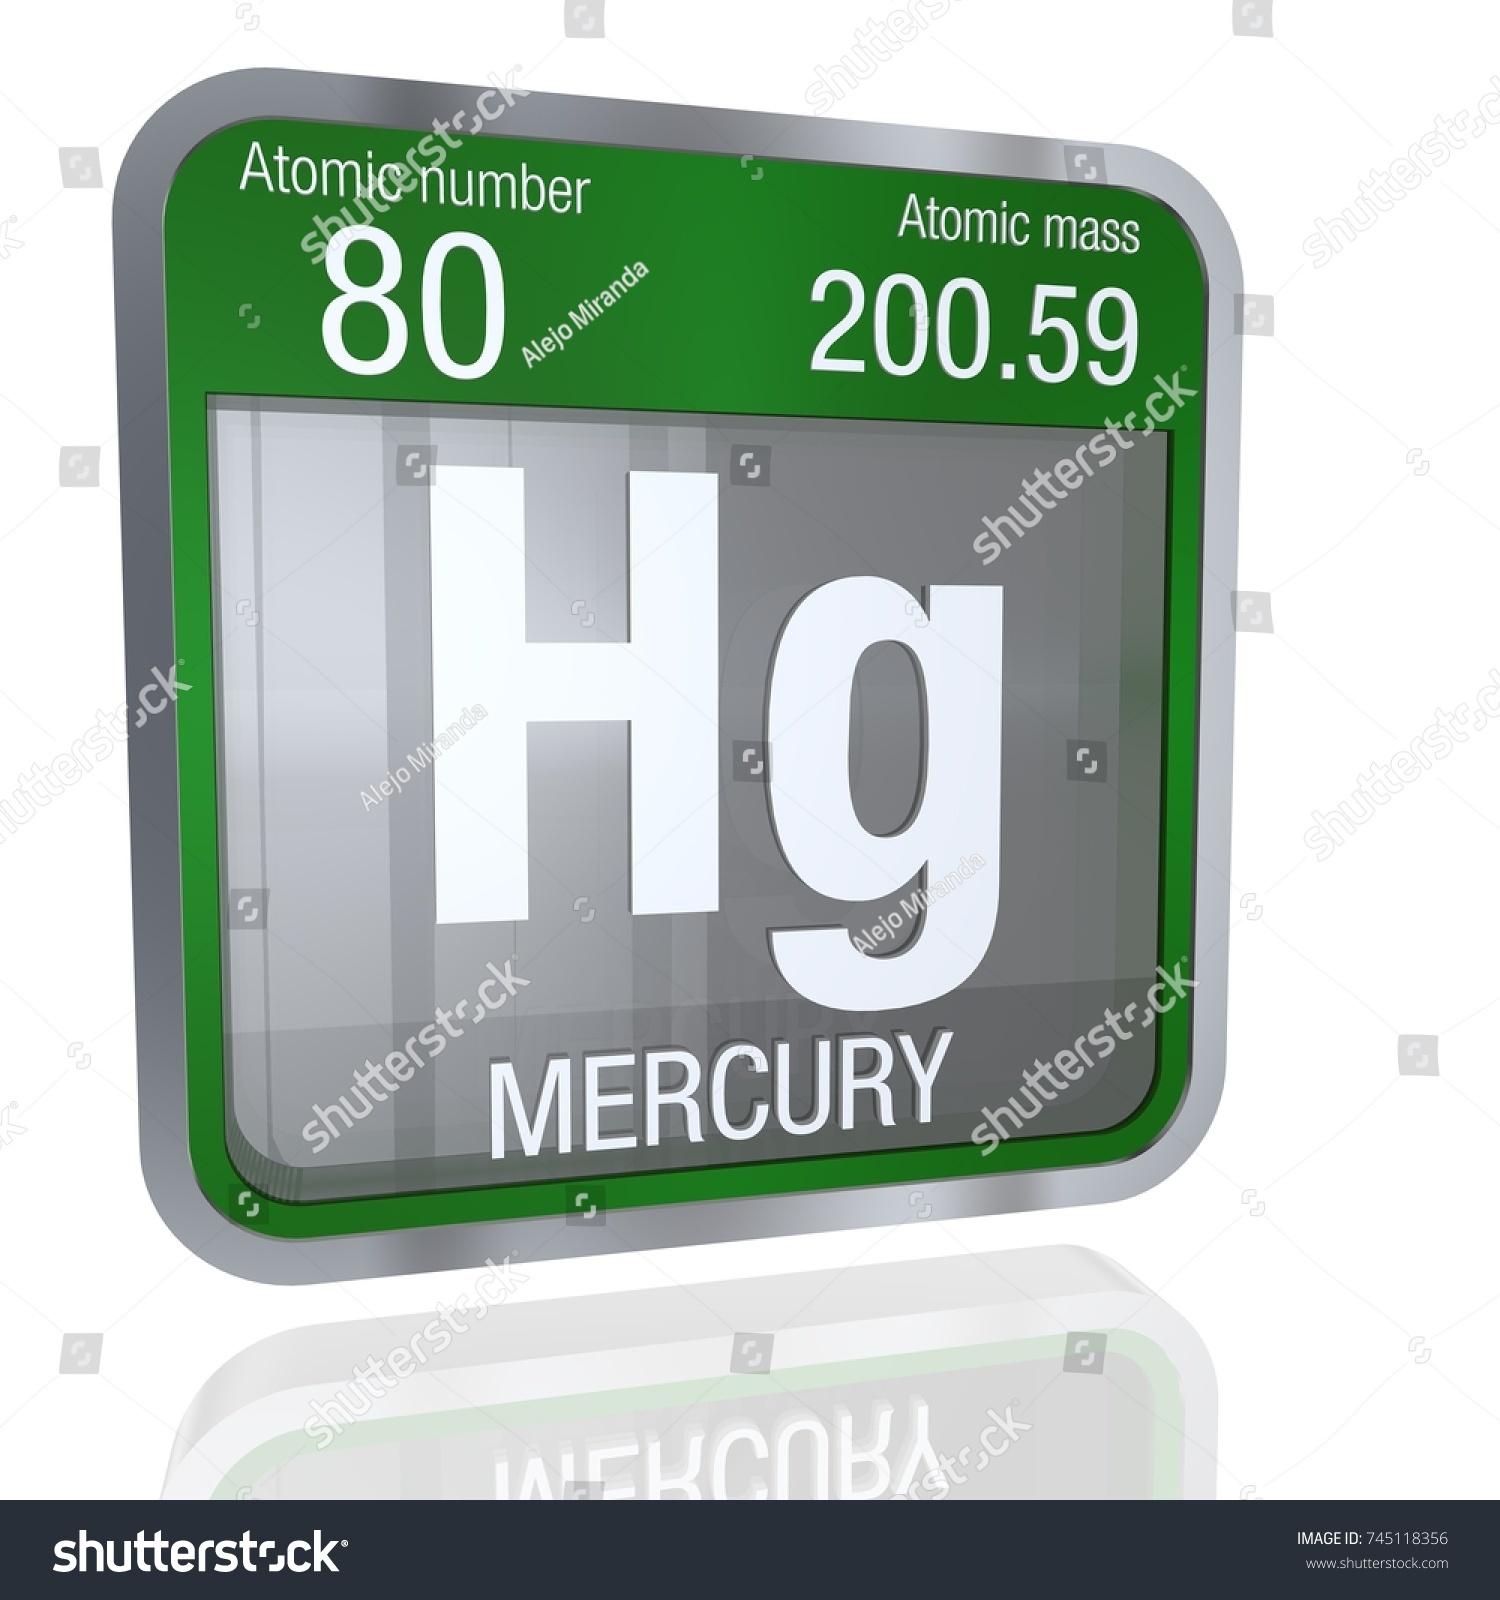 Mercury symbol square shape metallic border stock illustration mercury symbol in square shape with metallic border and transparent background with reflection on the floor urtaz Choice Image